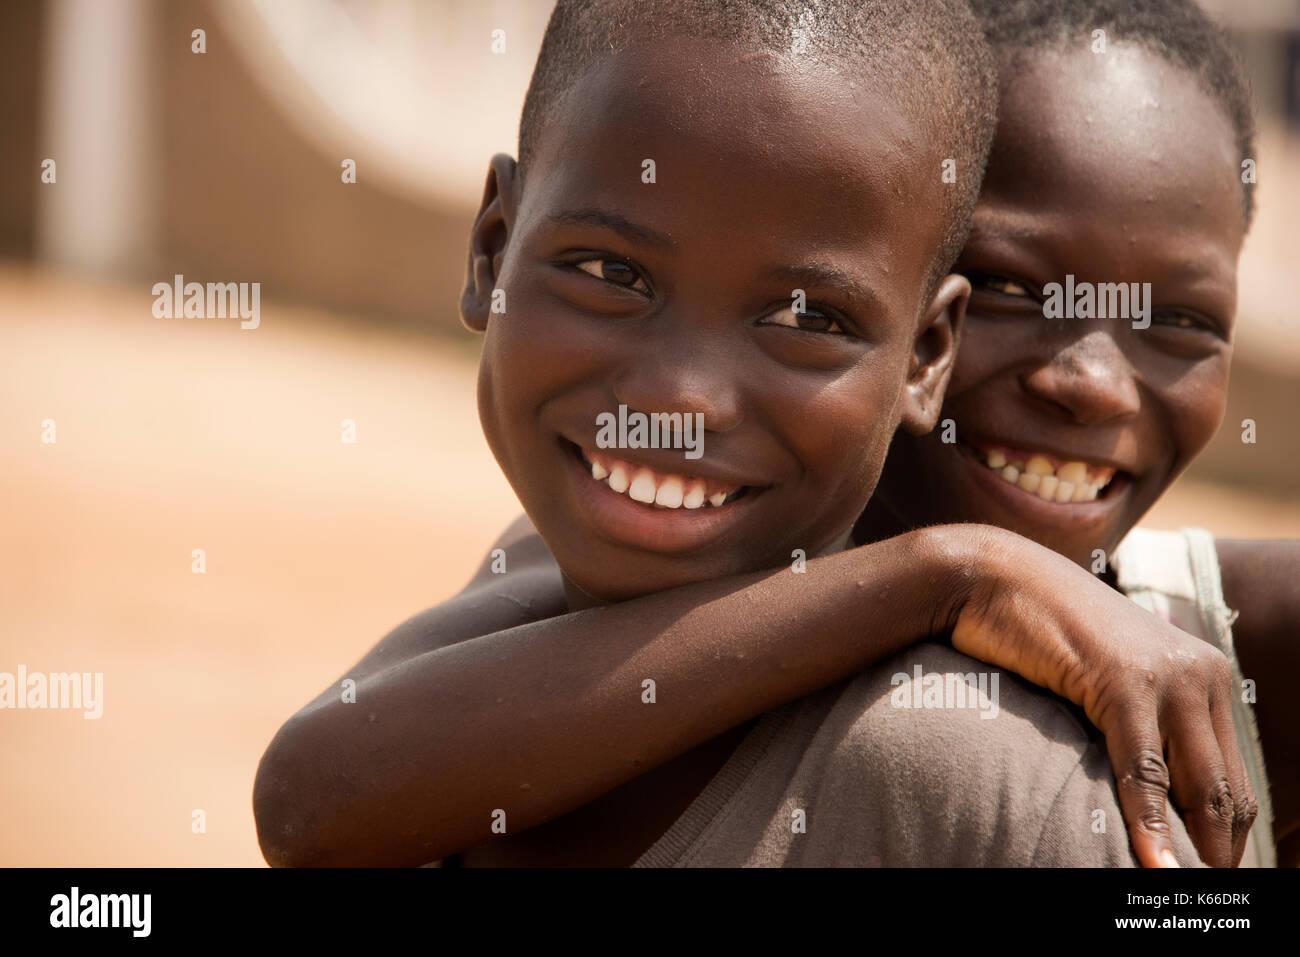 Ghanaian - Stock Image